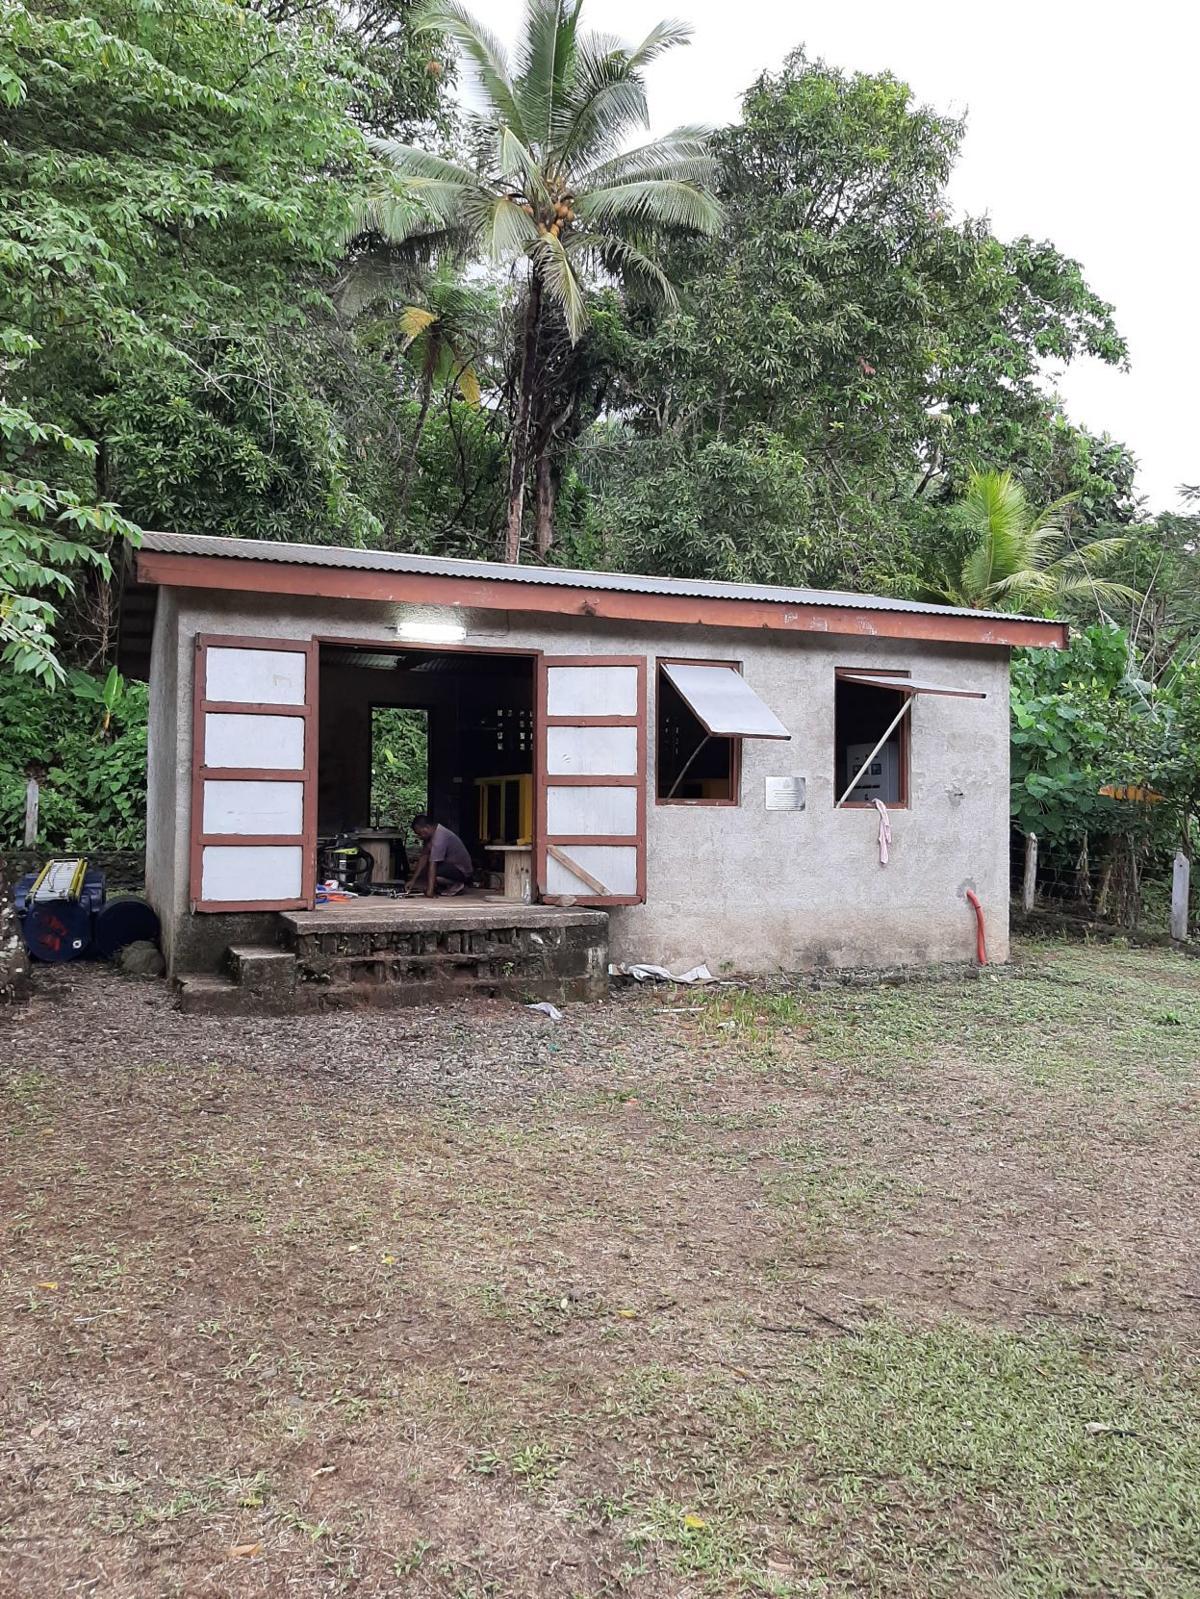 Vanuatu Utilities Company Operates In TORBA Headquarter